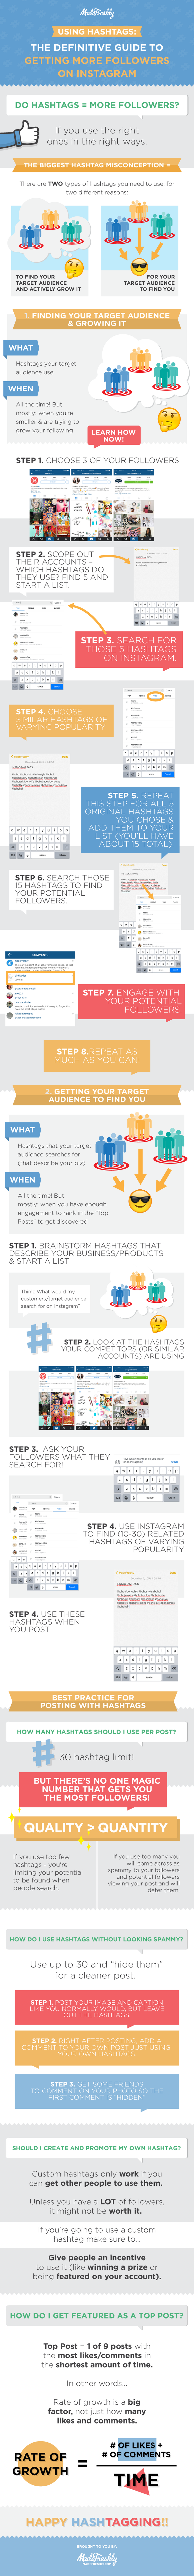 Using-Instagram-Hashtags